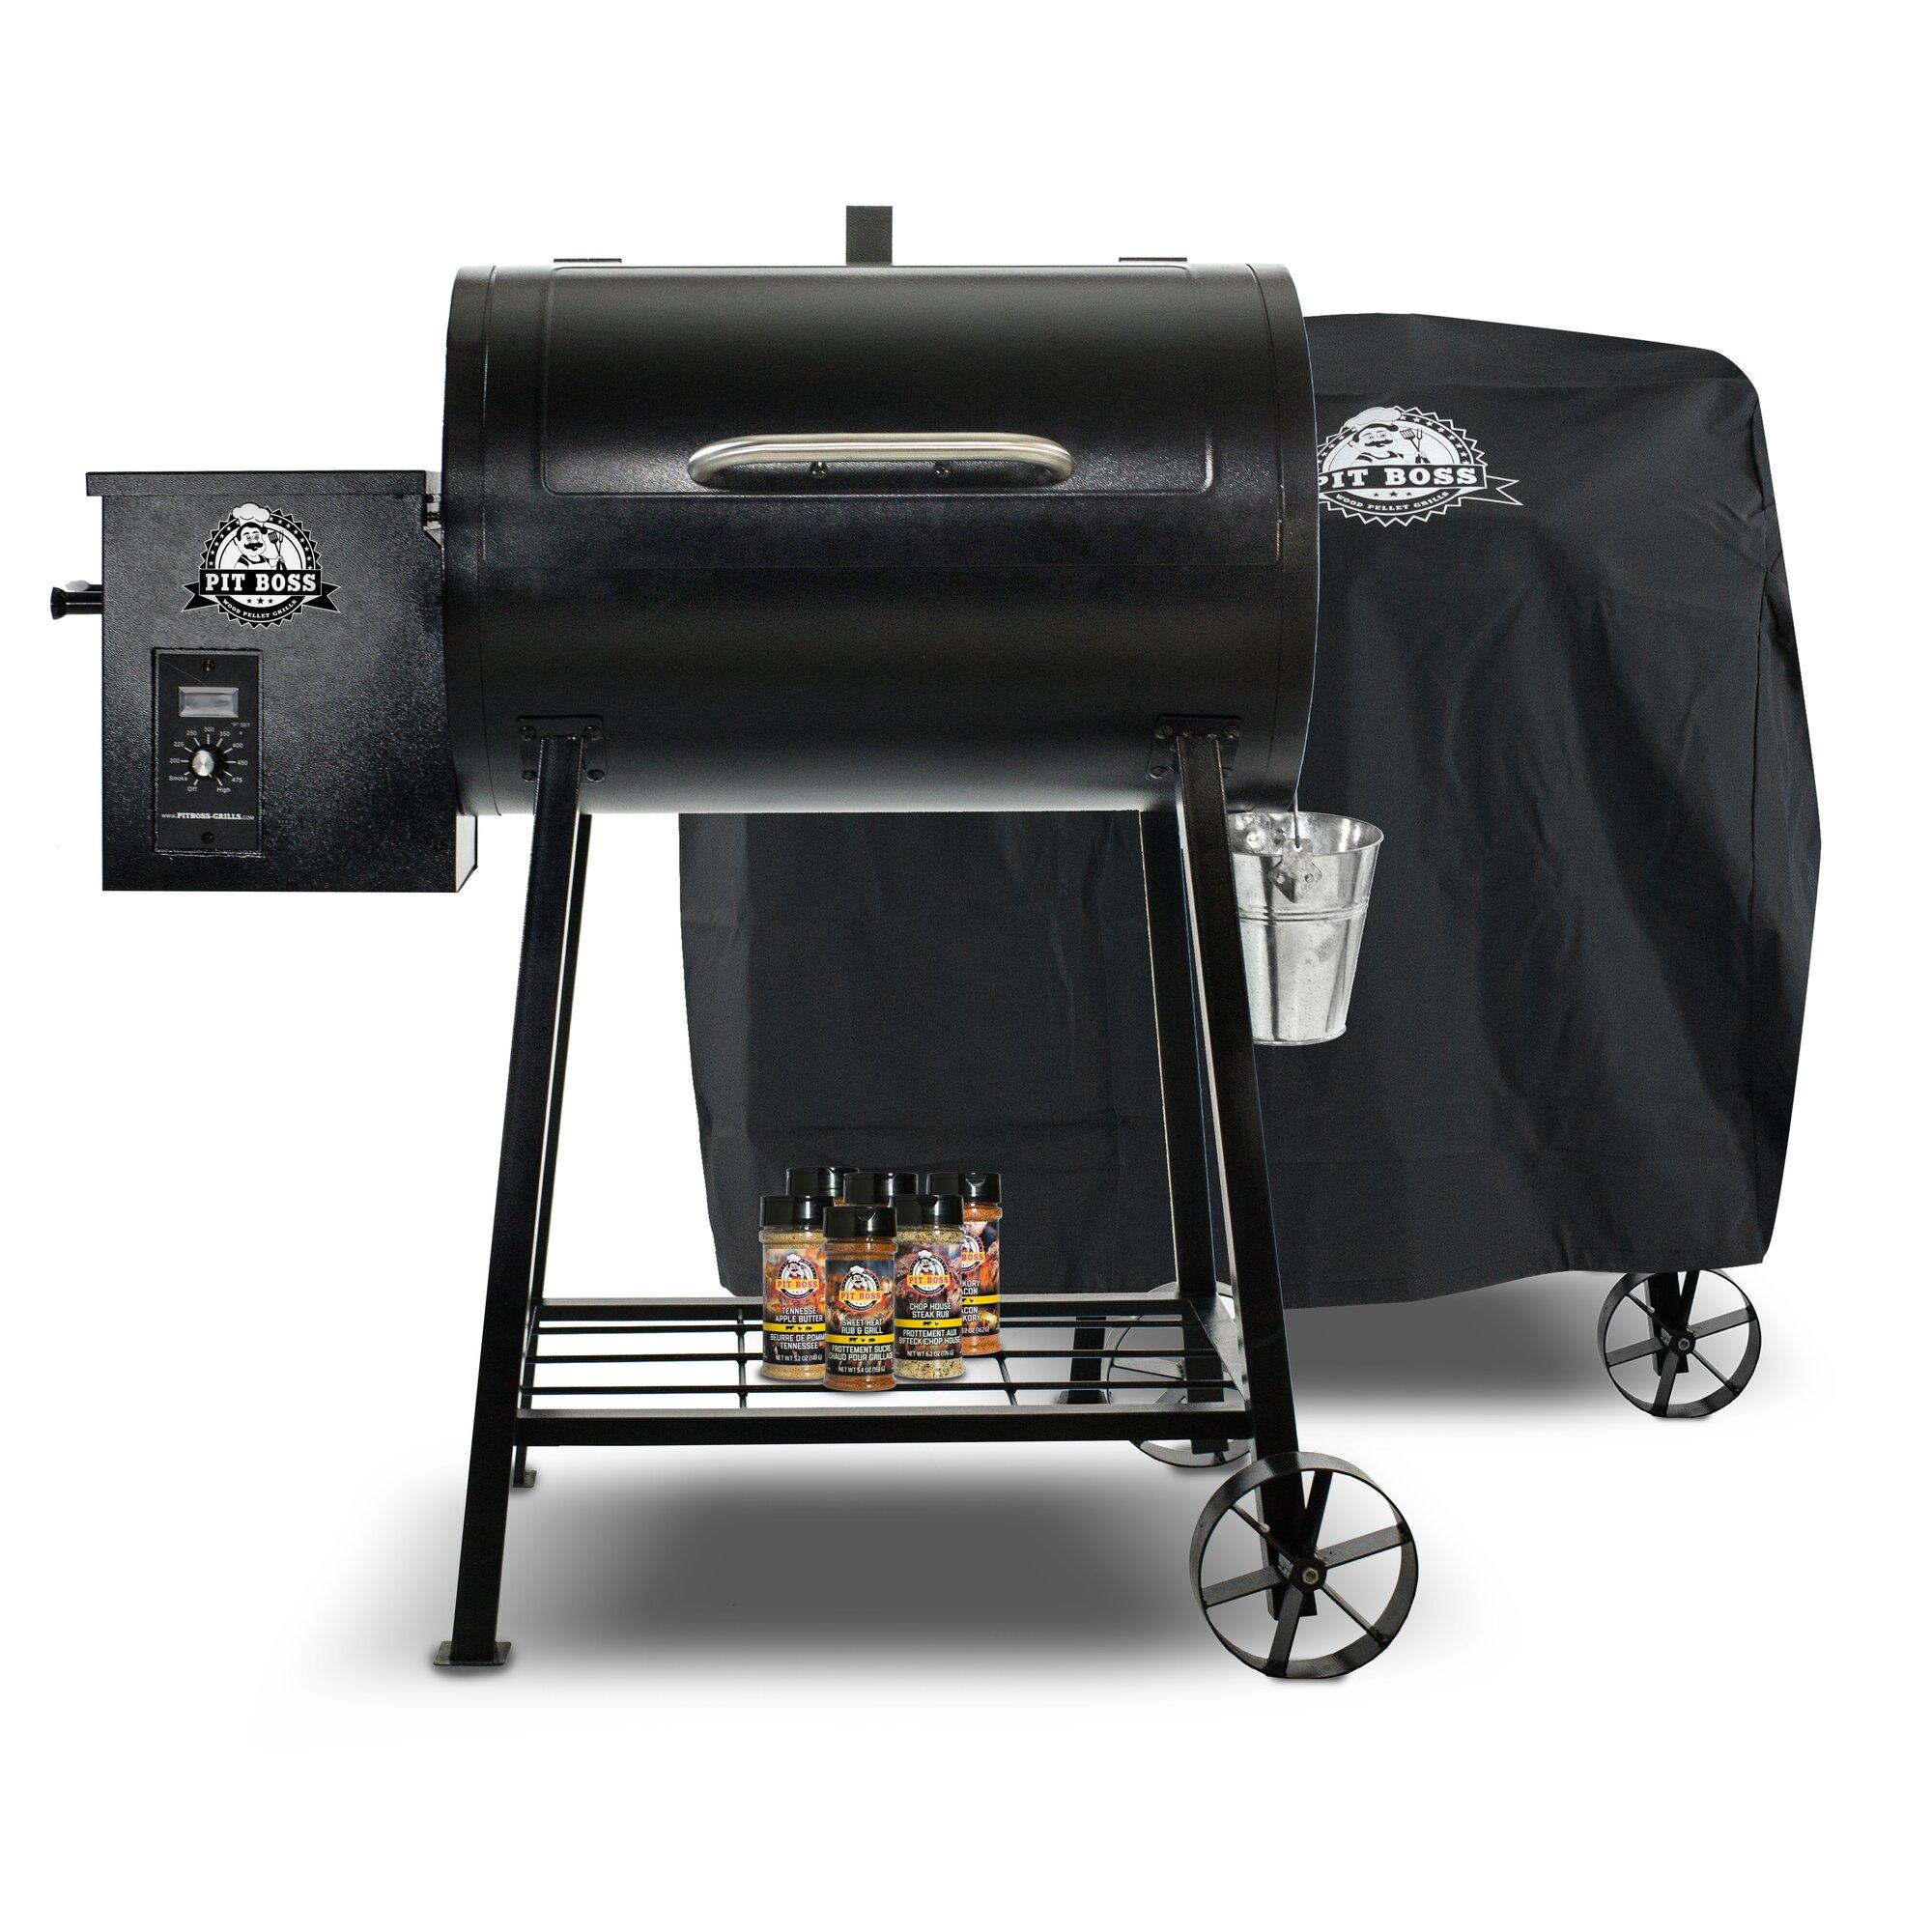 Pit Boss 340 Wood/Pellet Grill with Smoker | Wayfair.ca